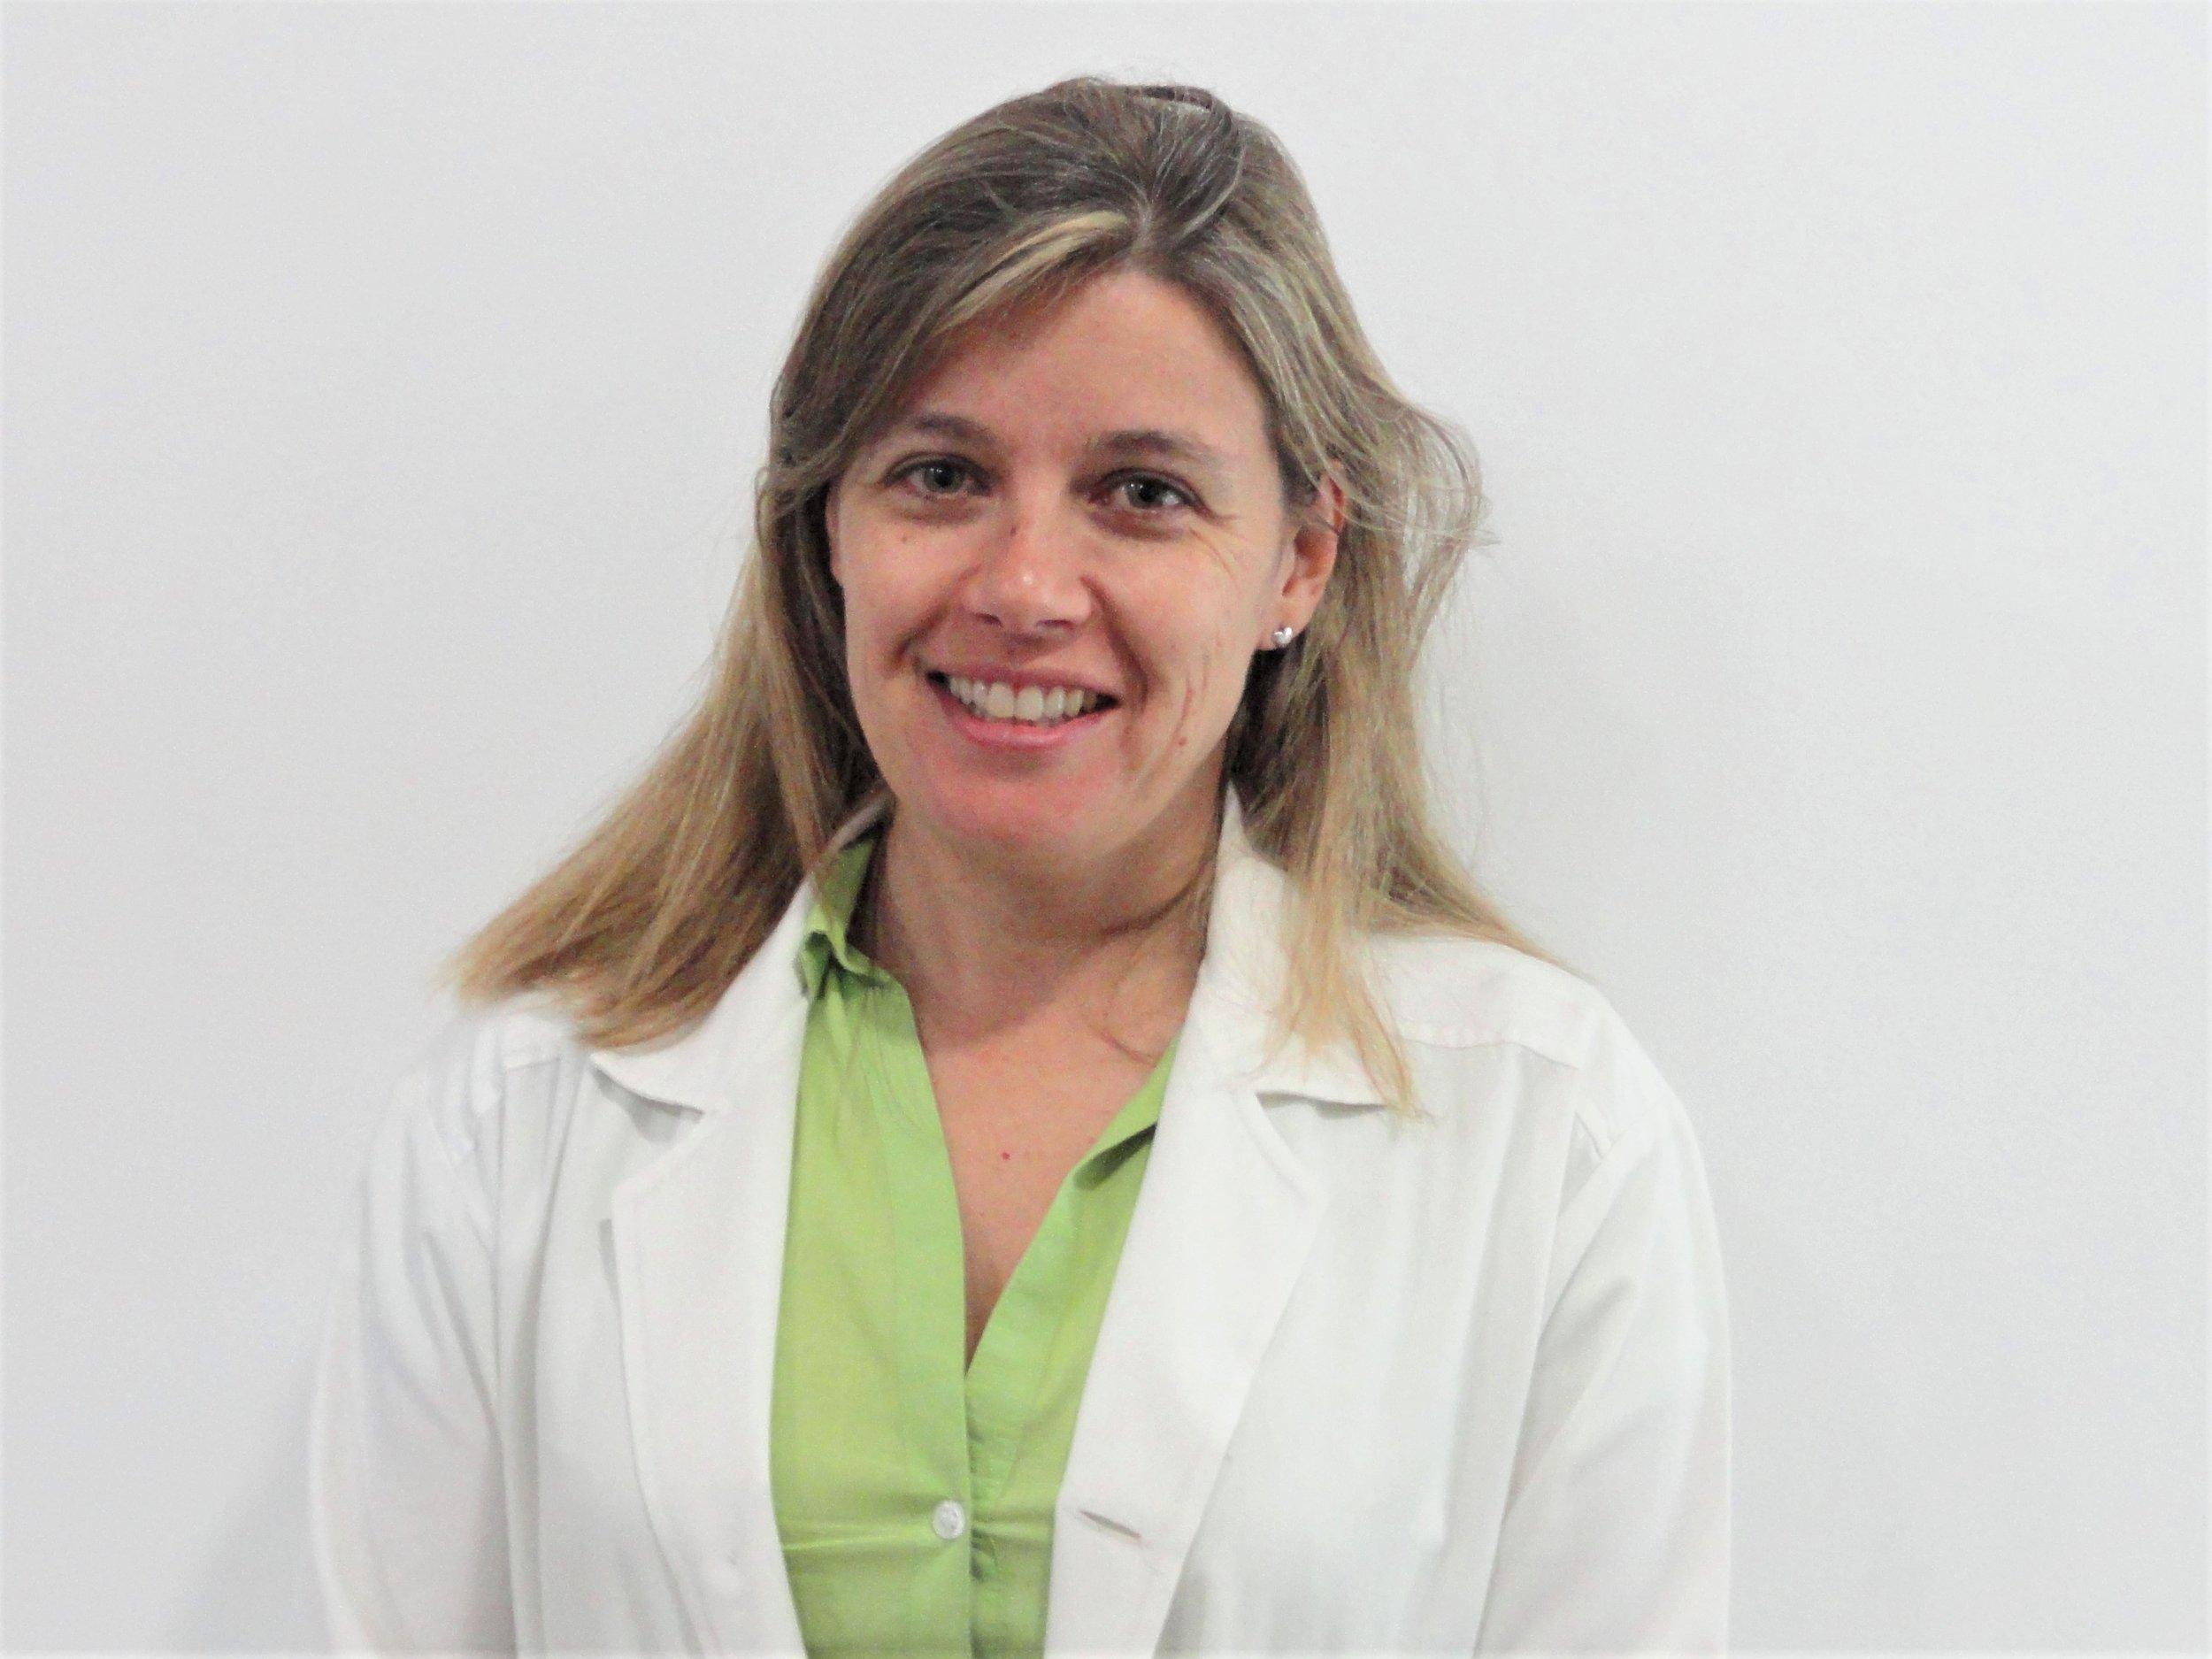 Profª Drª Raquel Gil Gouveia copia- Neurologia (1).jpg